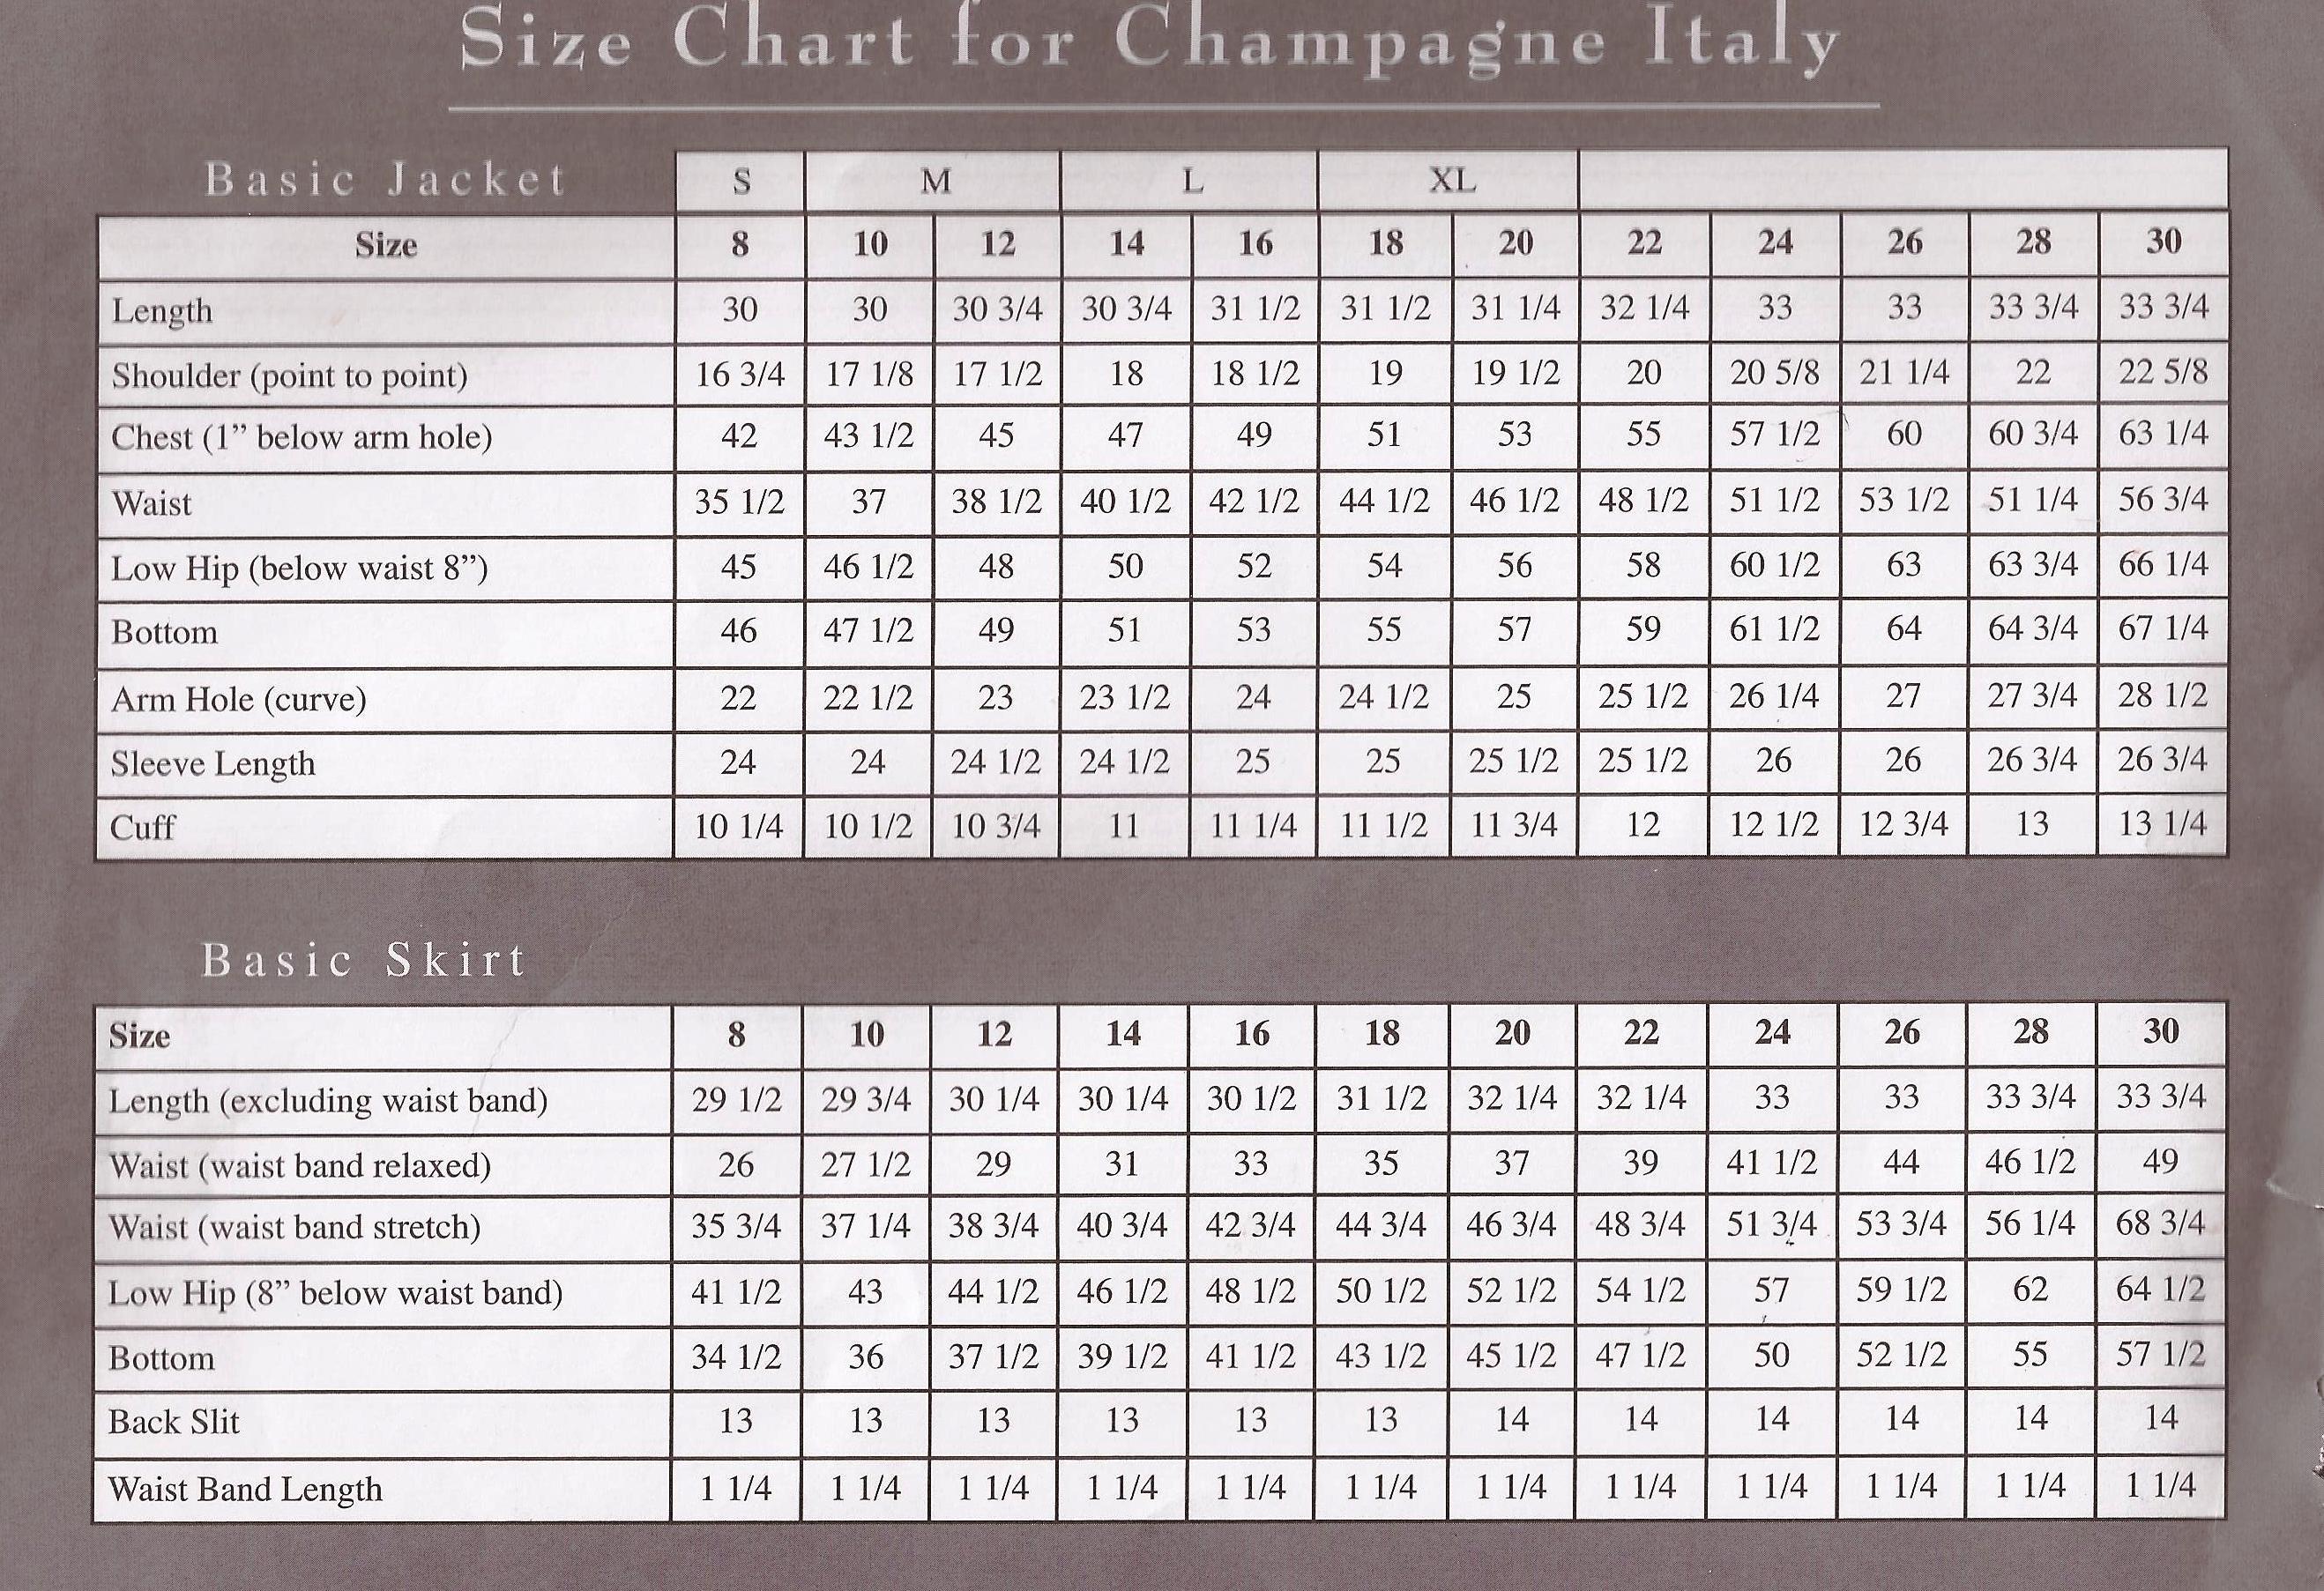 champ-size-chart.jpg